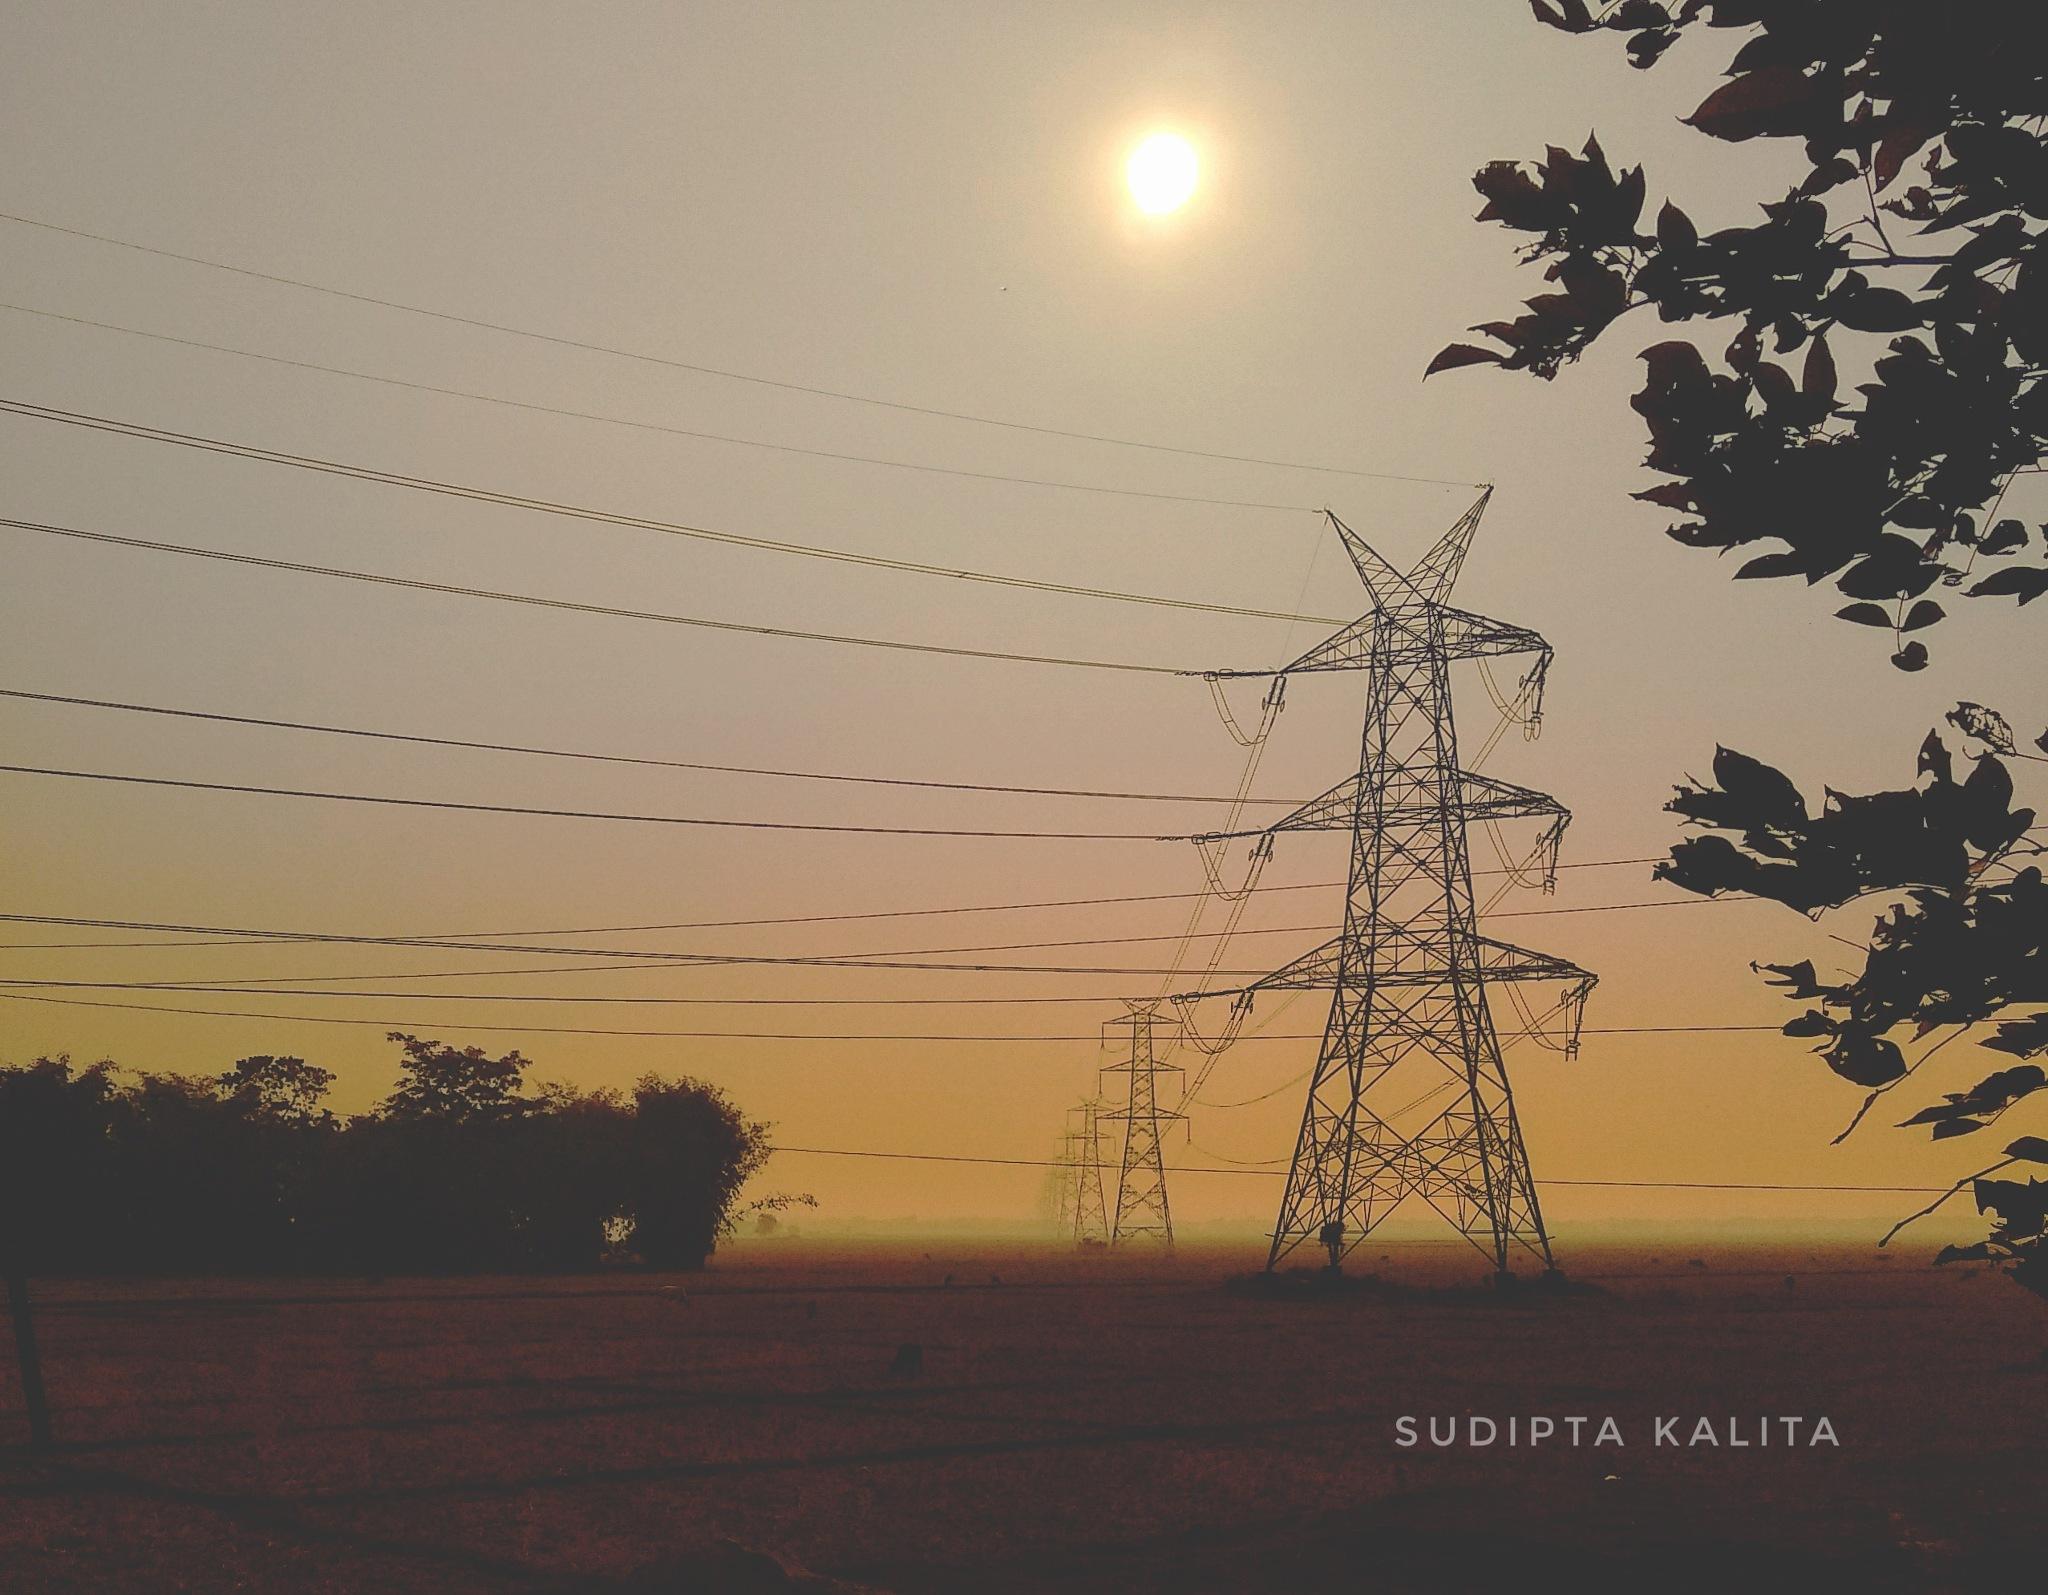 A peace of mind by Sudipta Kalita